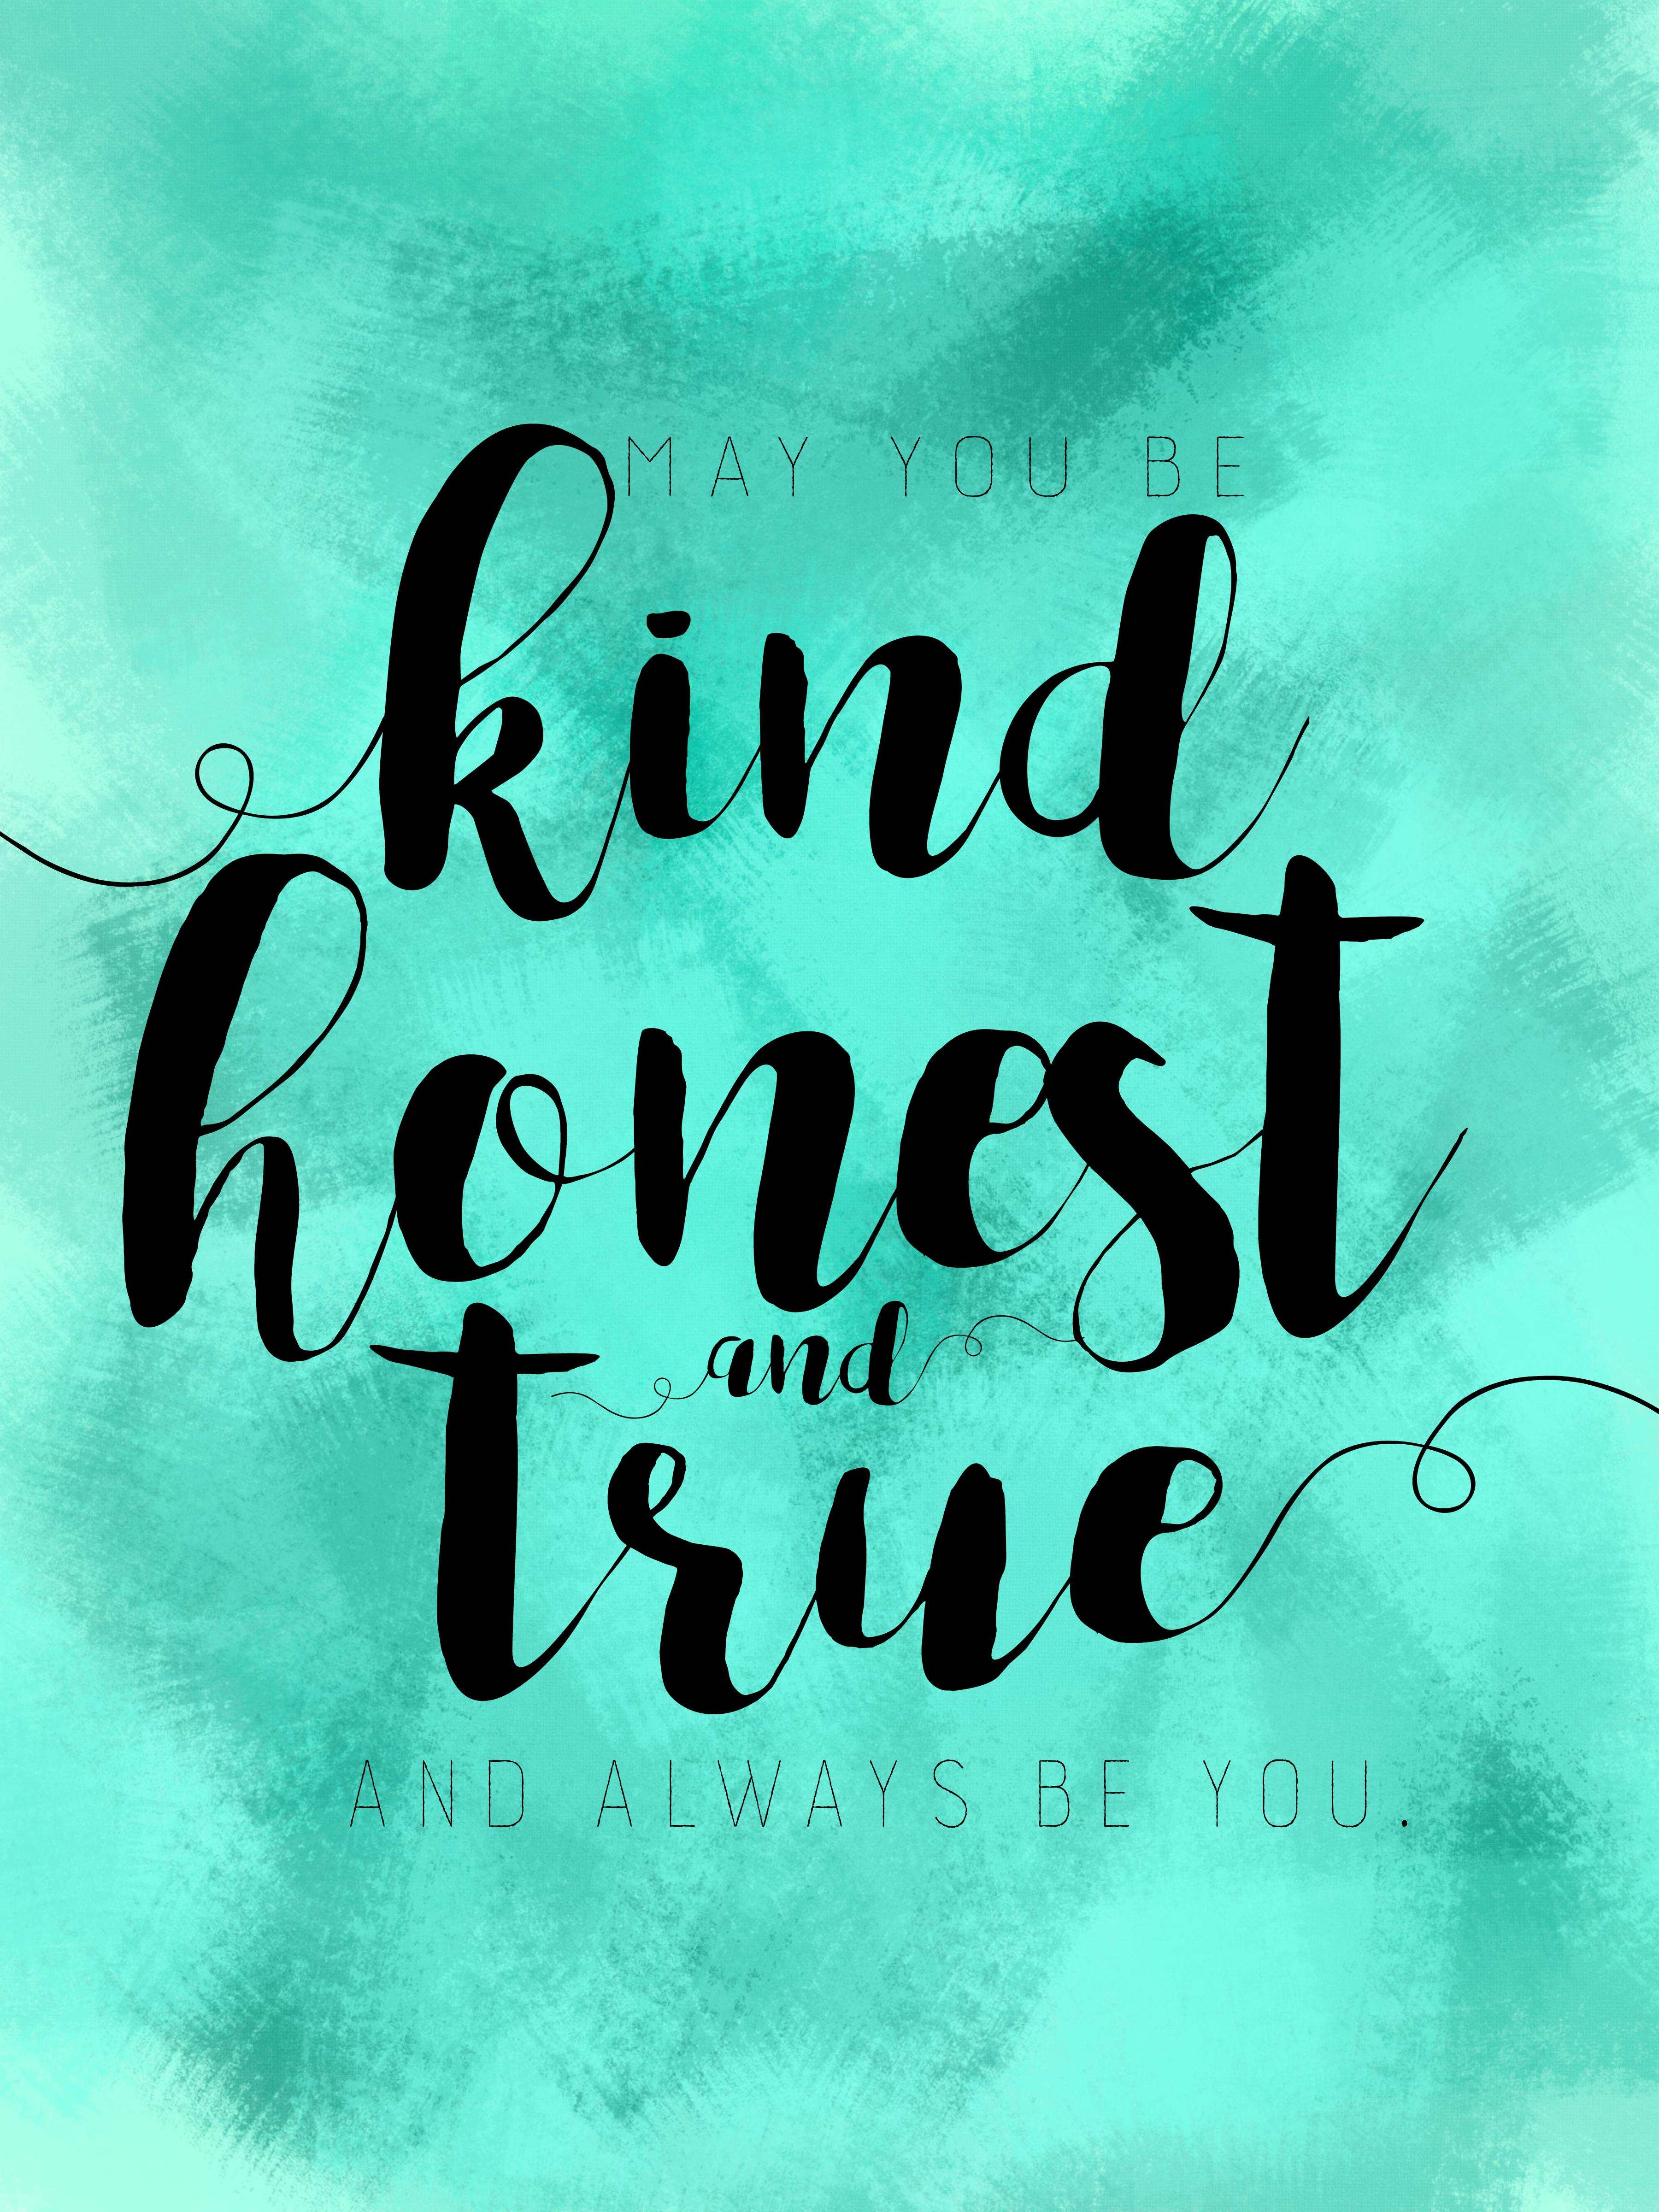 kind honest true - turquoise